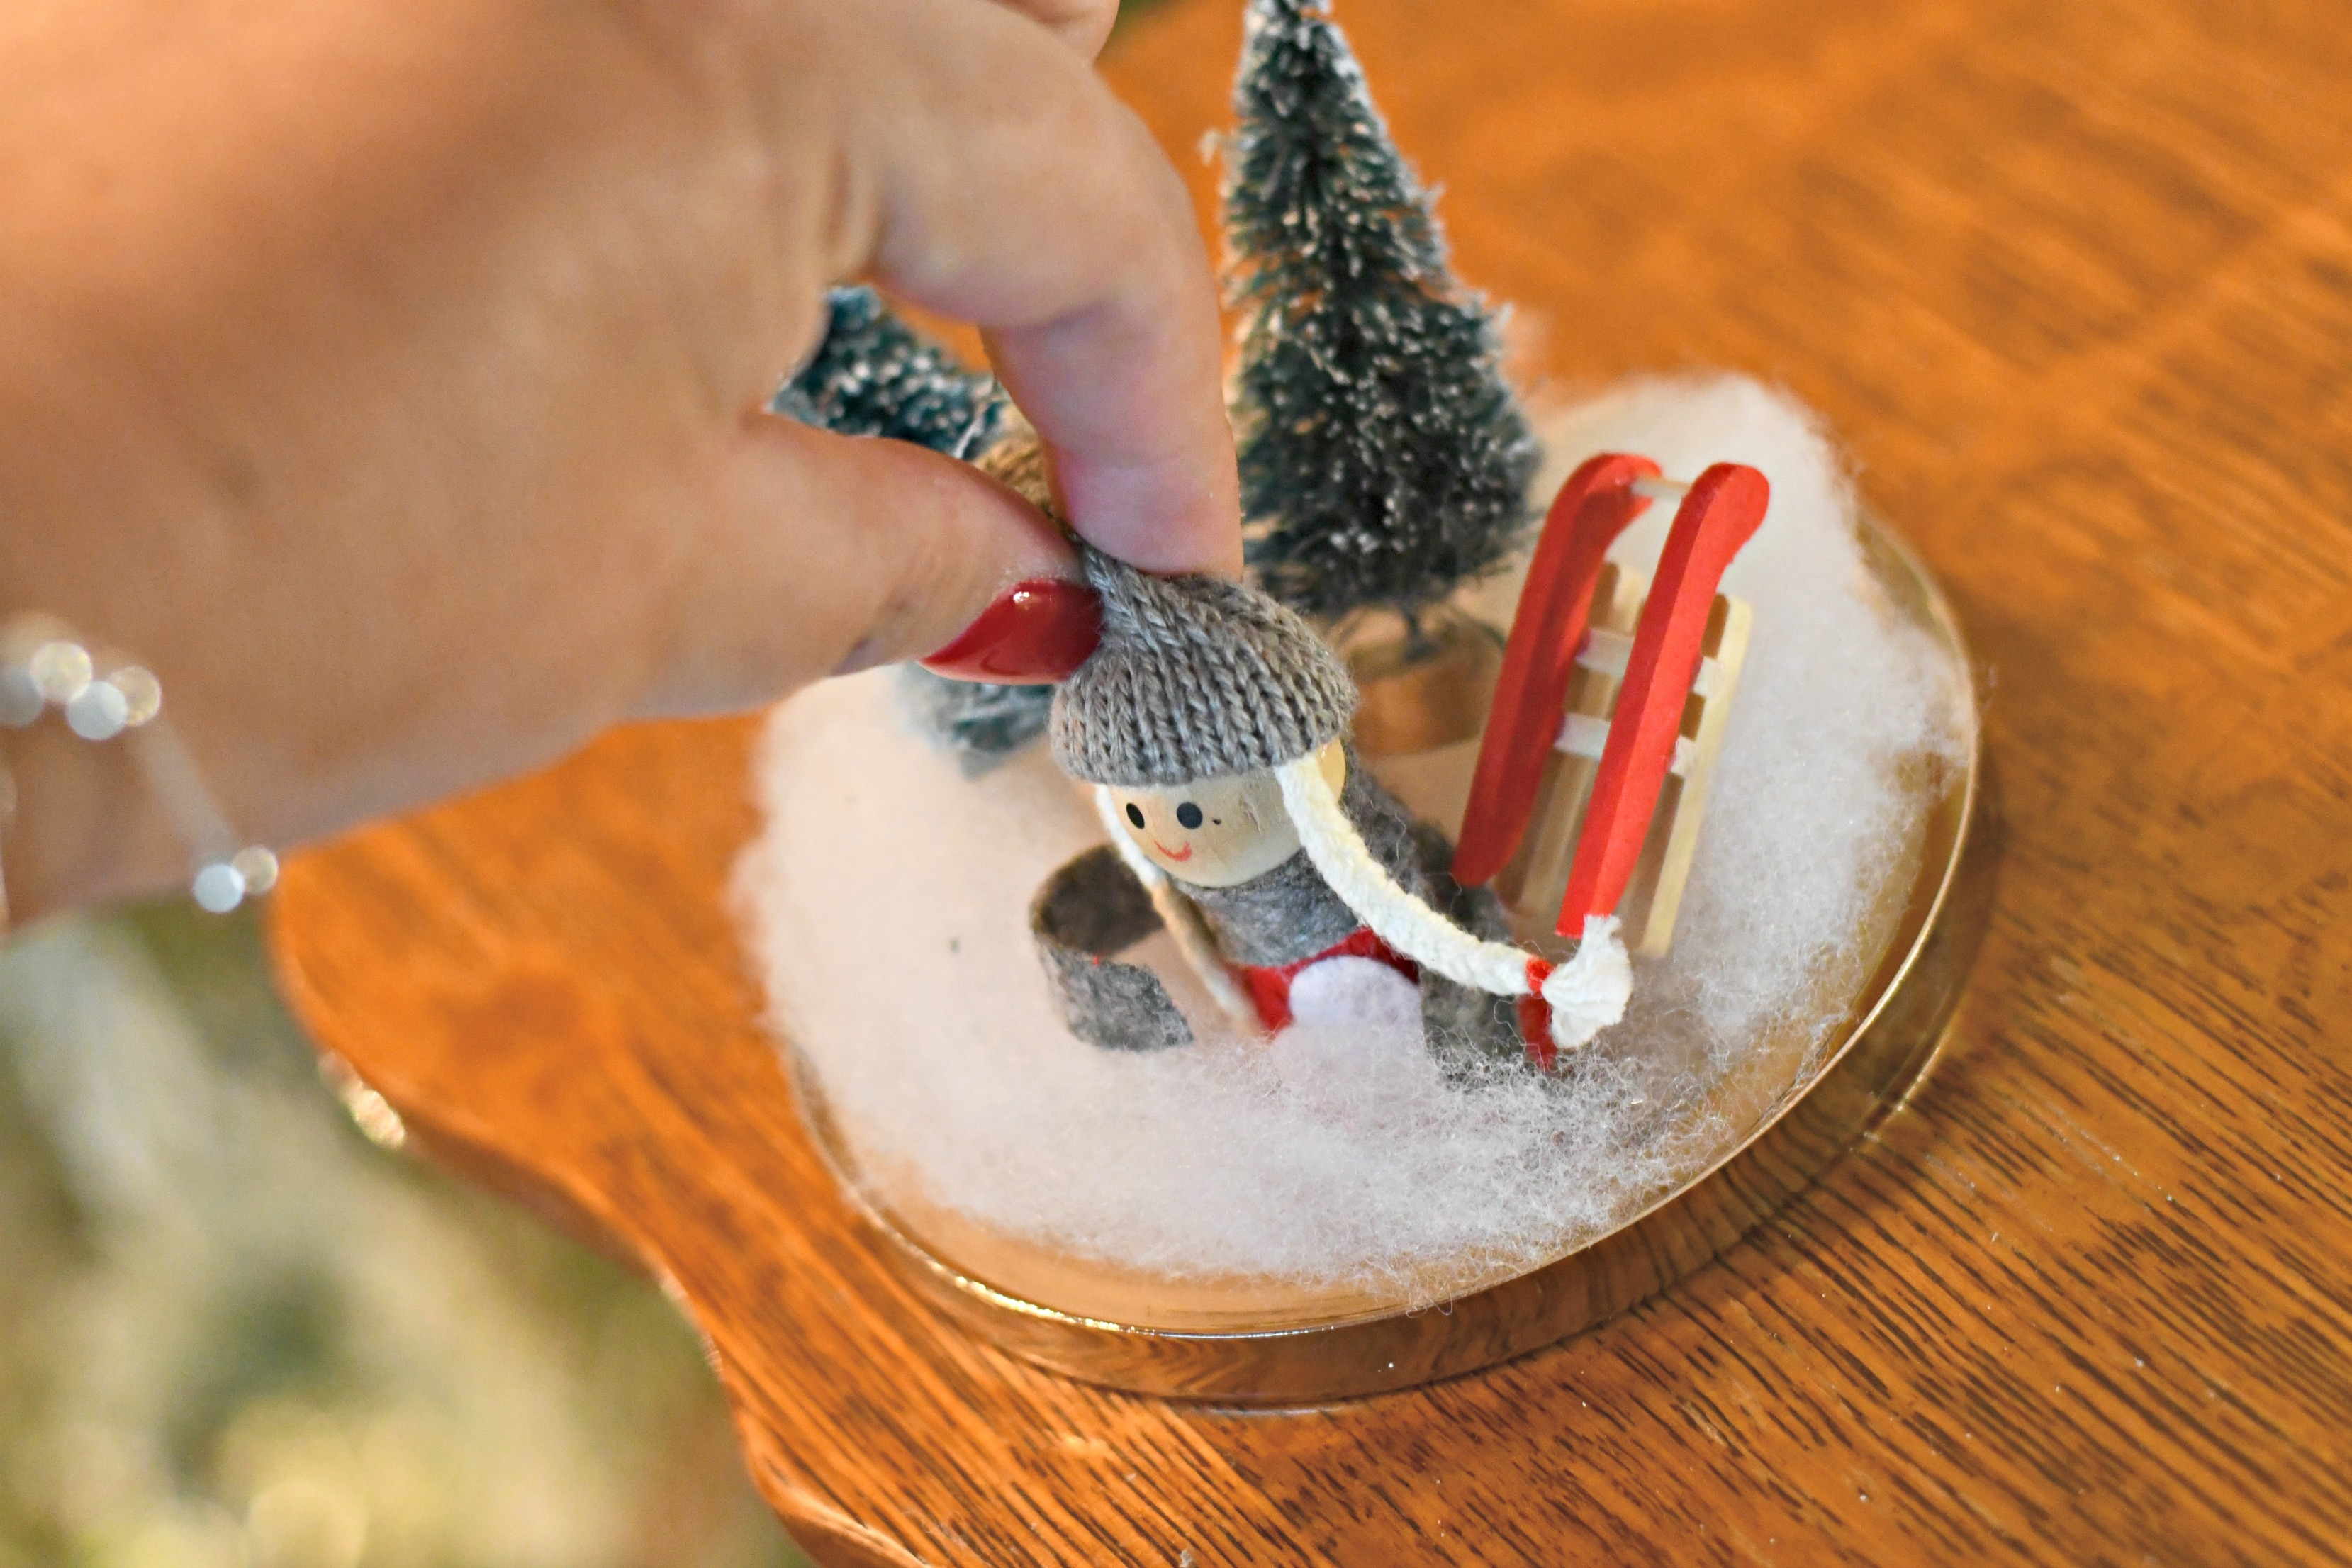 Bed Bath & Beyond Candle Jar into a DIY Snow Globe